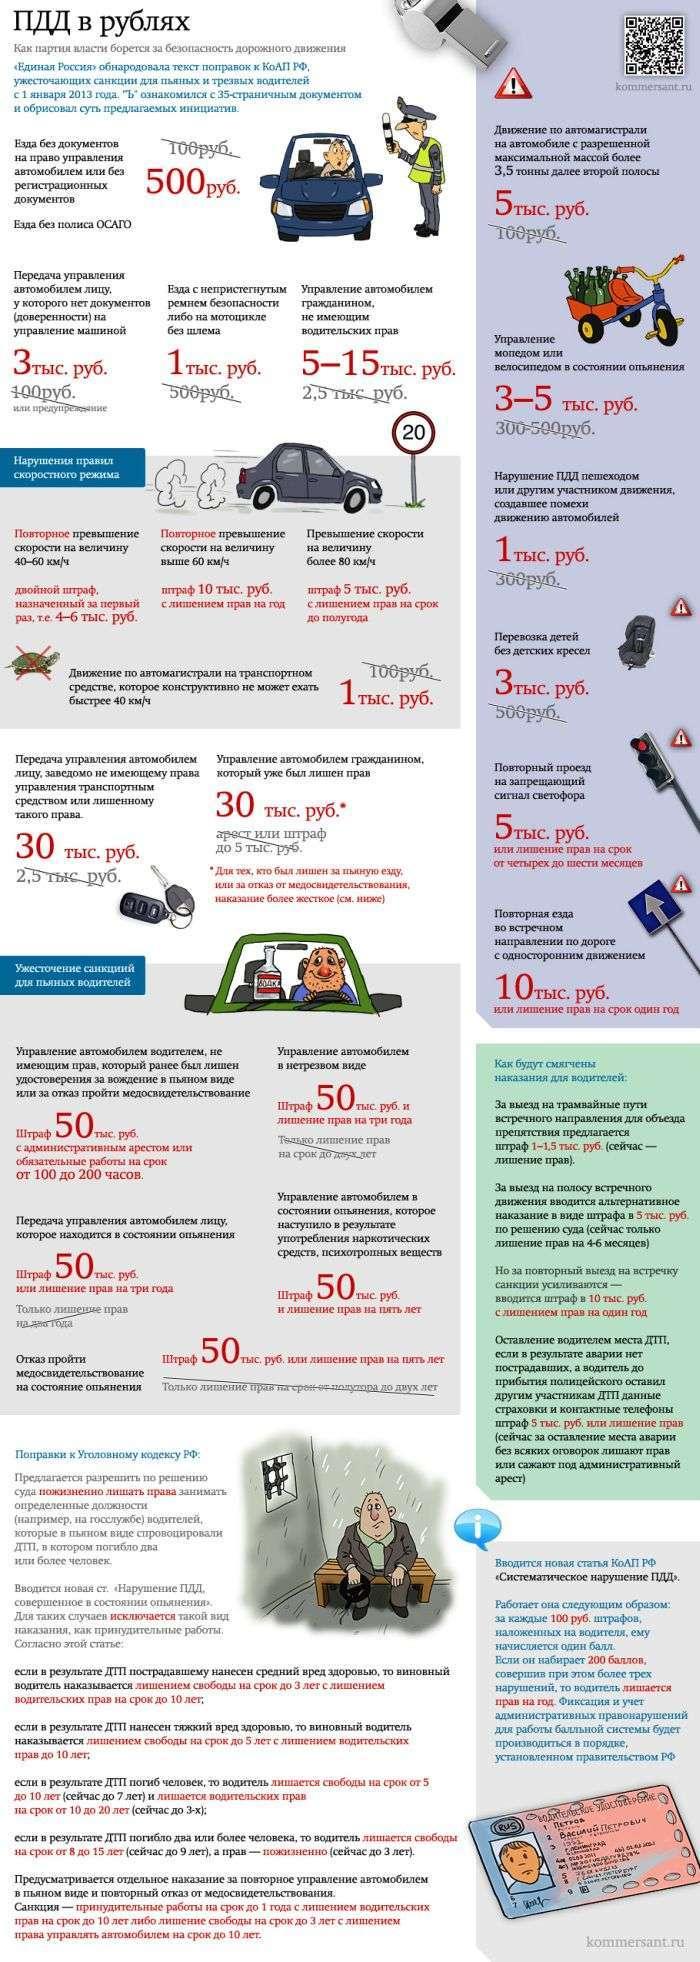 Скільки заплатять порушники ПДР (1 картинка)